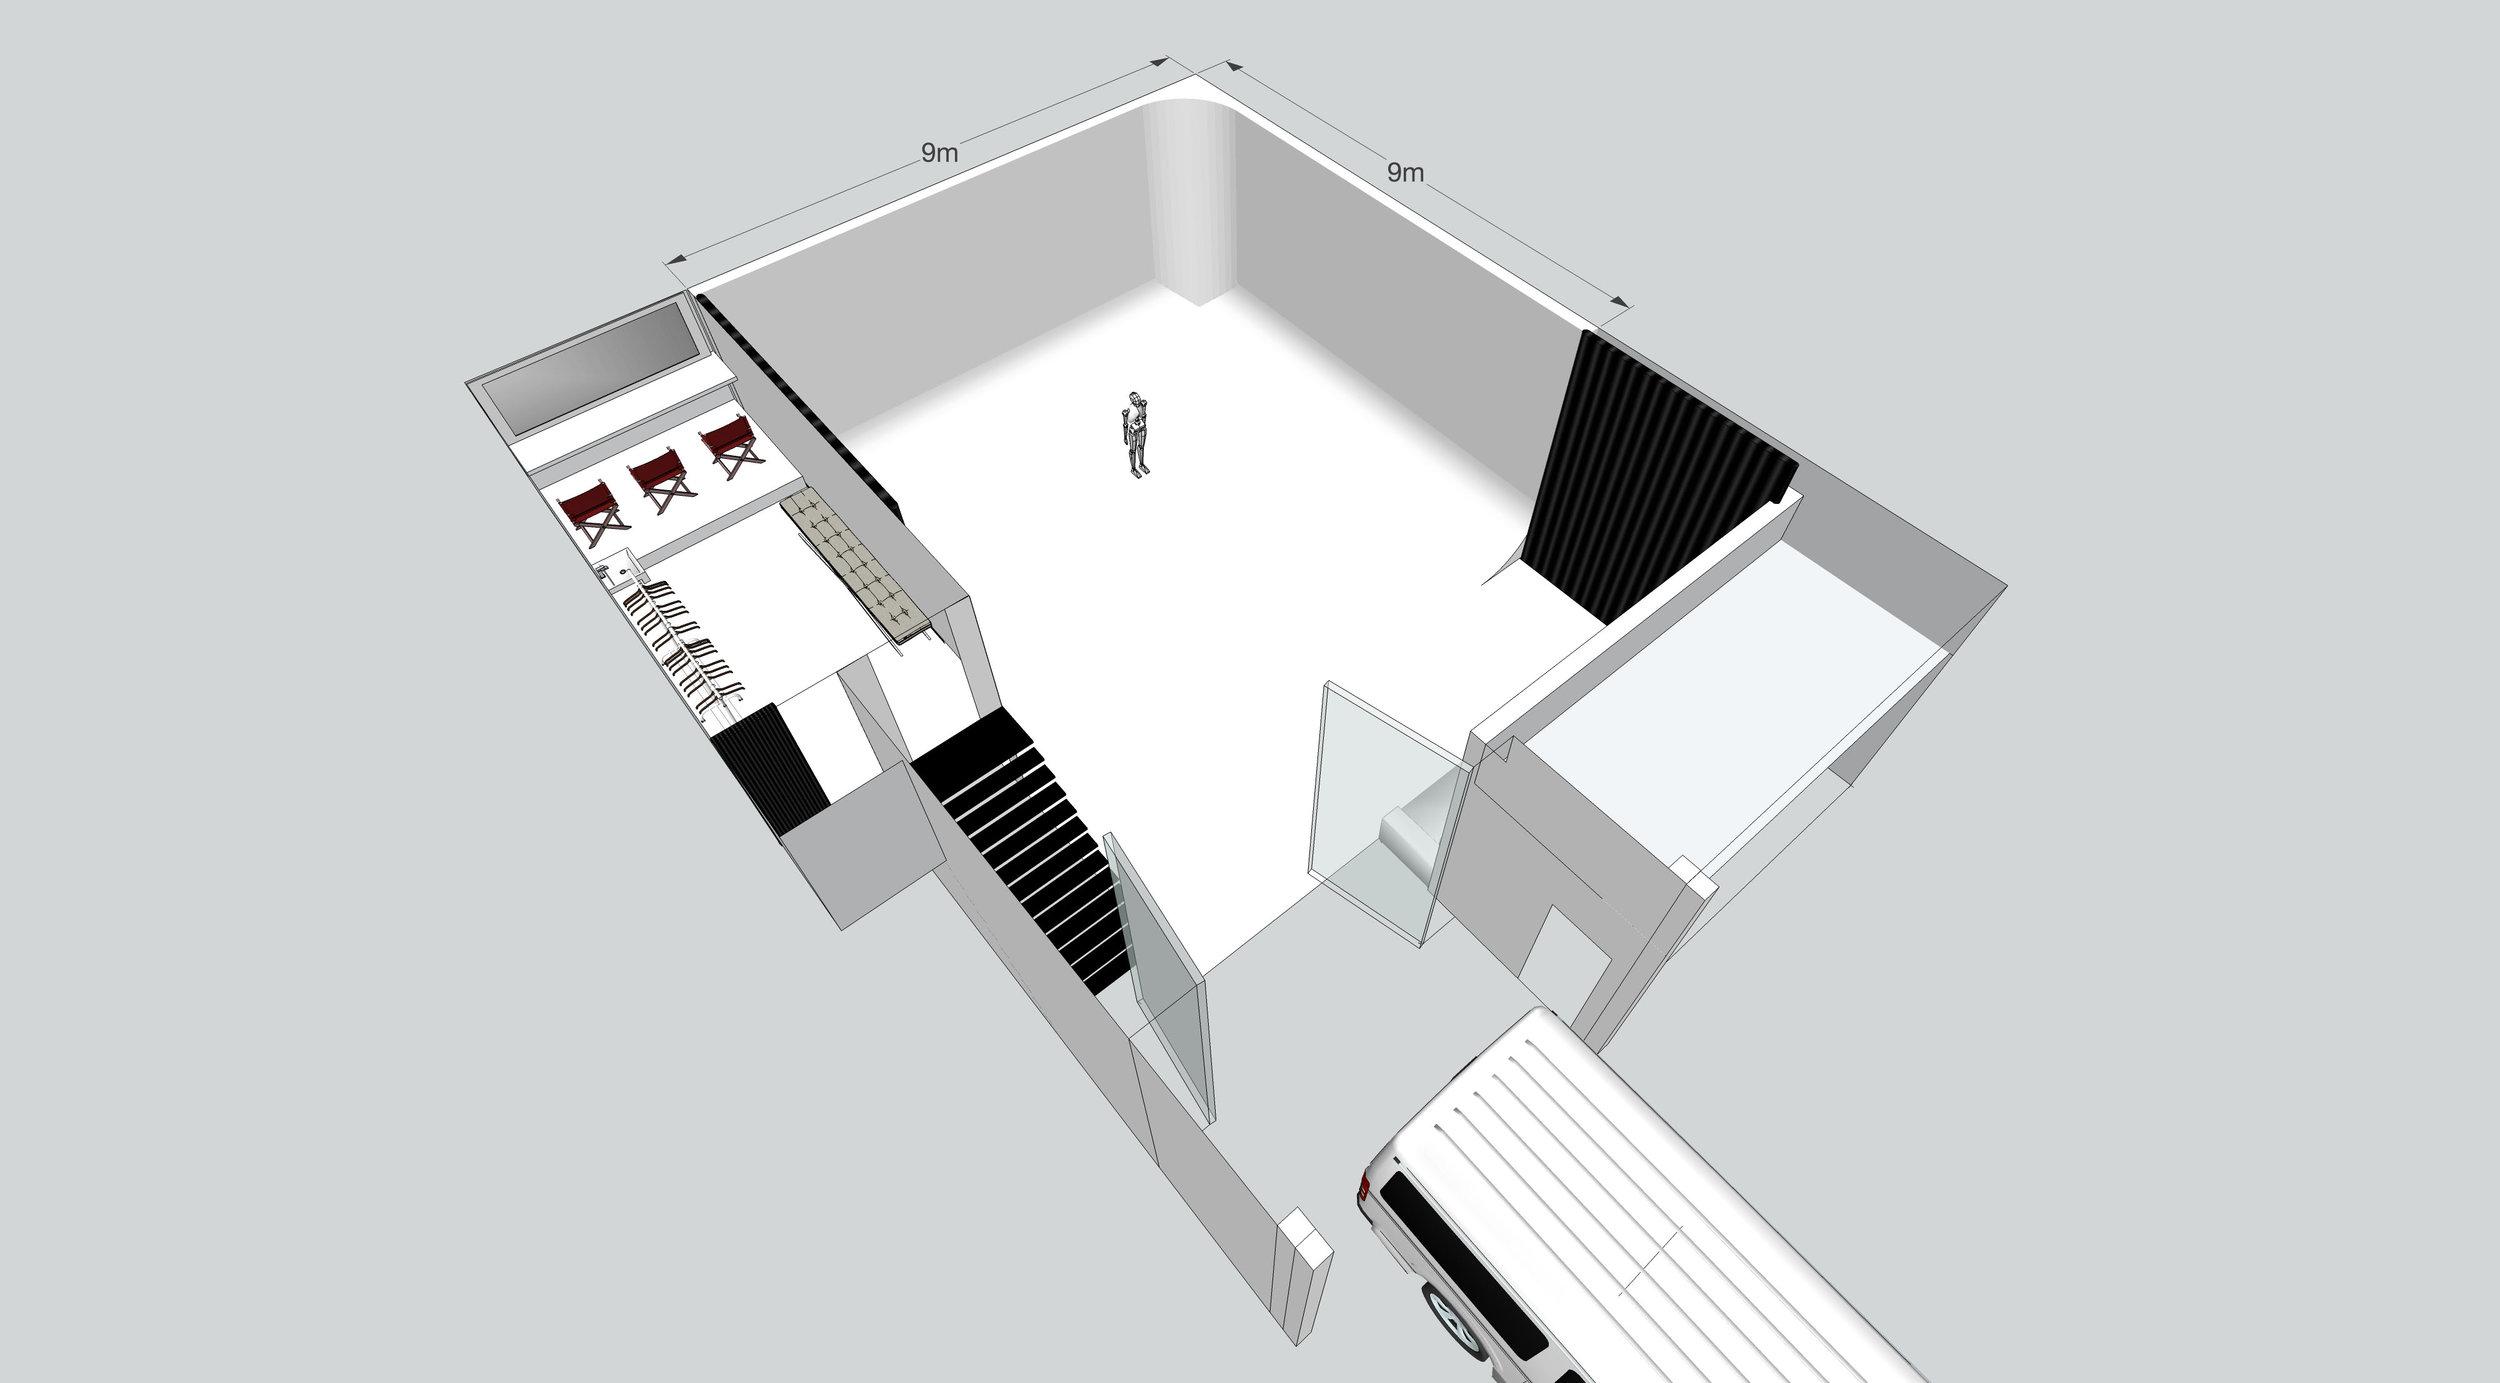 Untitled1_0002_STUDIO dimensions004.tiff.jpg